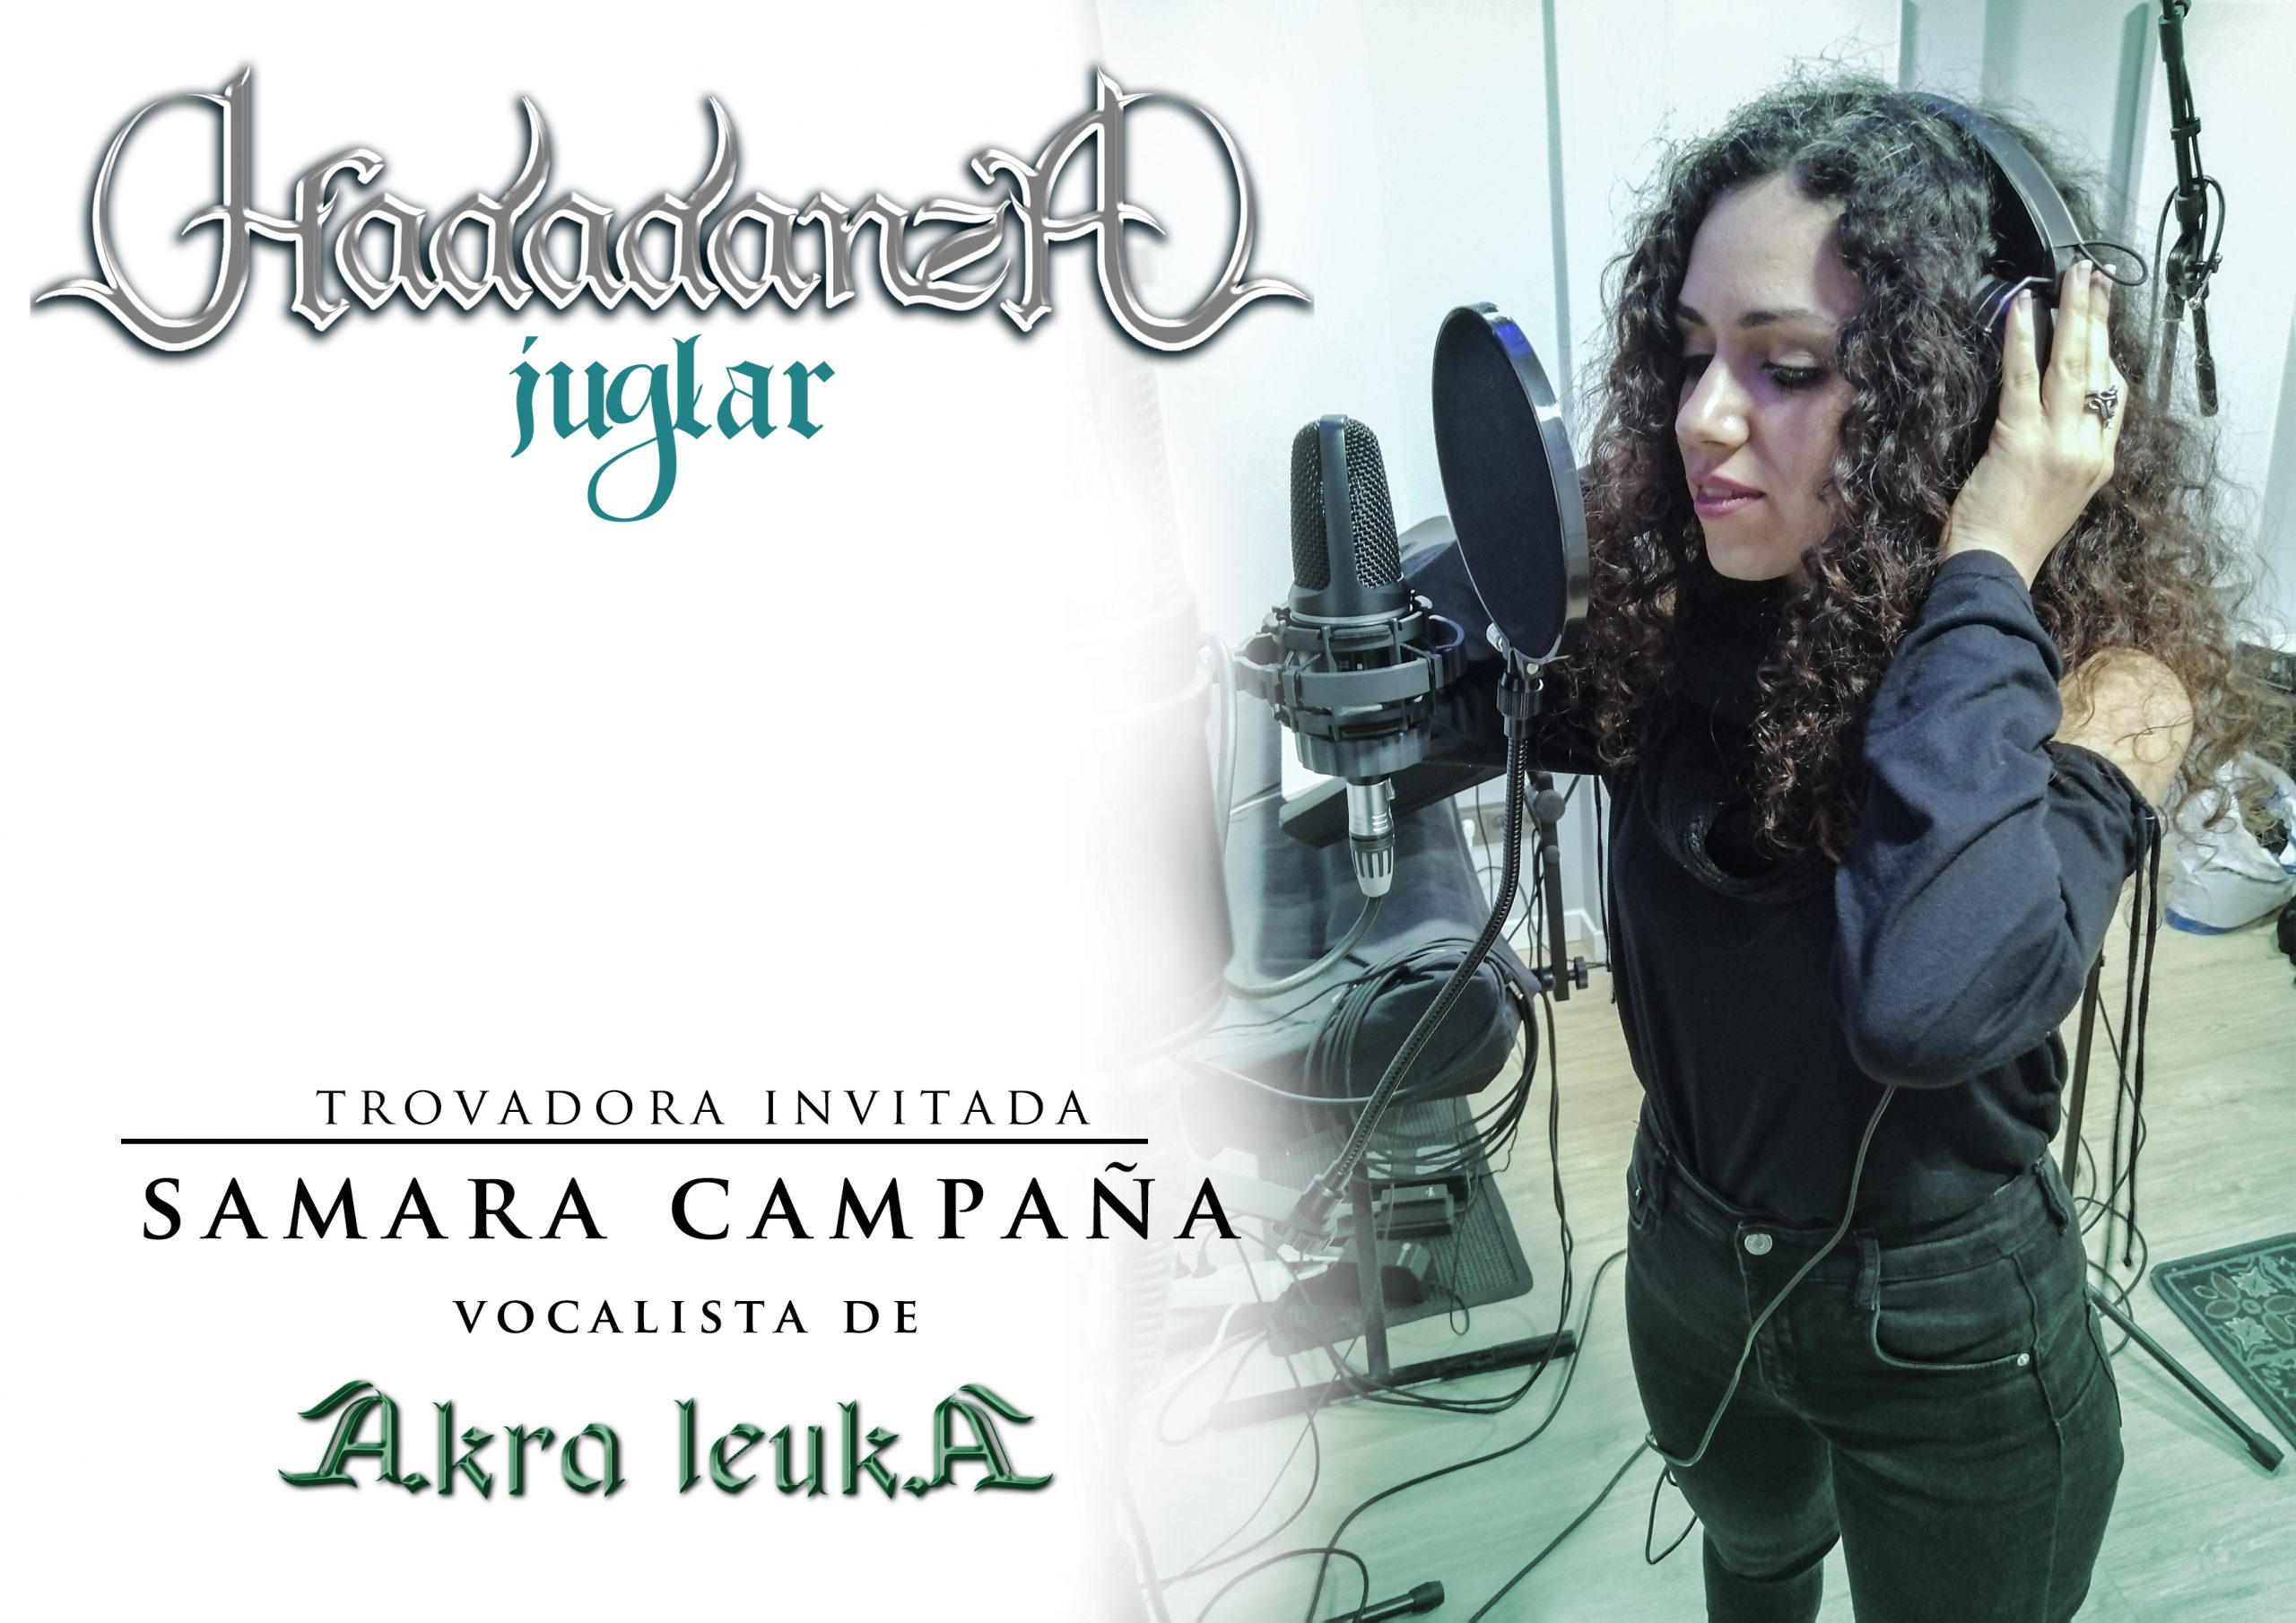 FOLK METAL ROCK - SAMARA CAMPAÑA EN JUGLAR